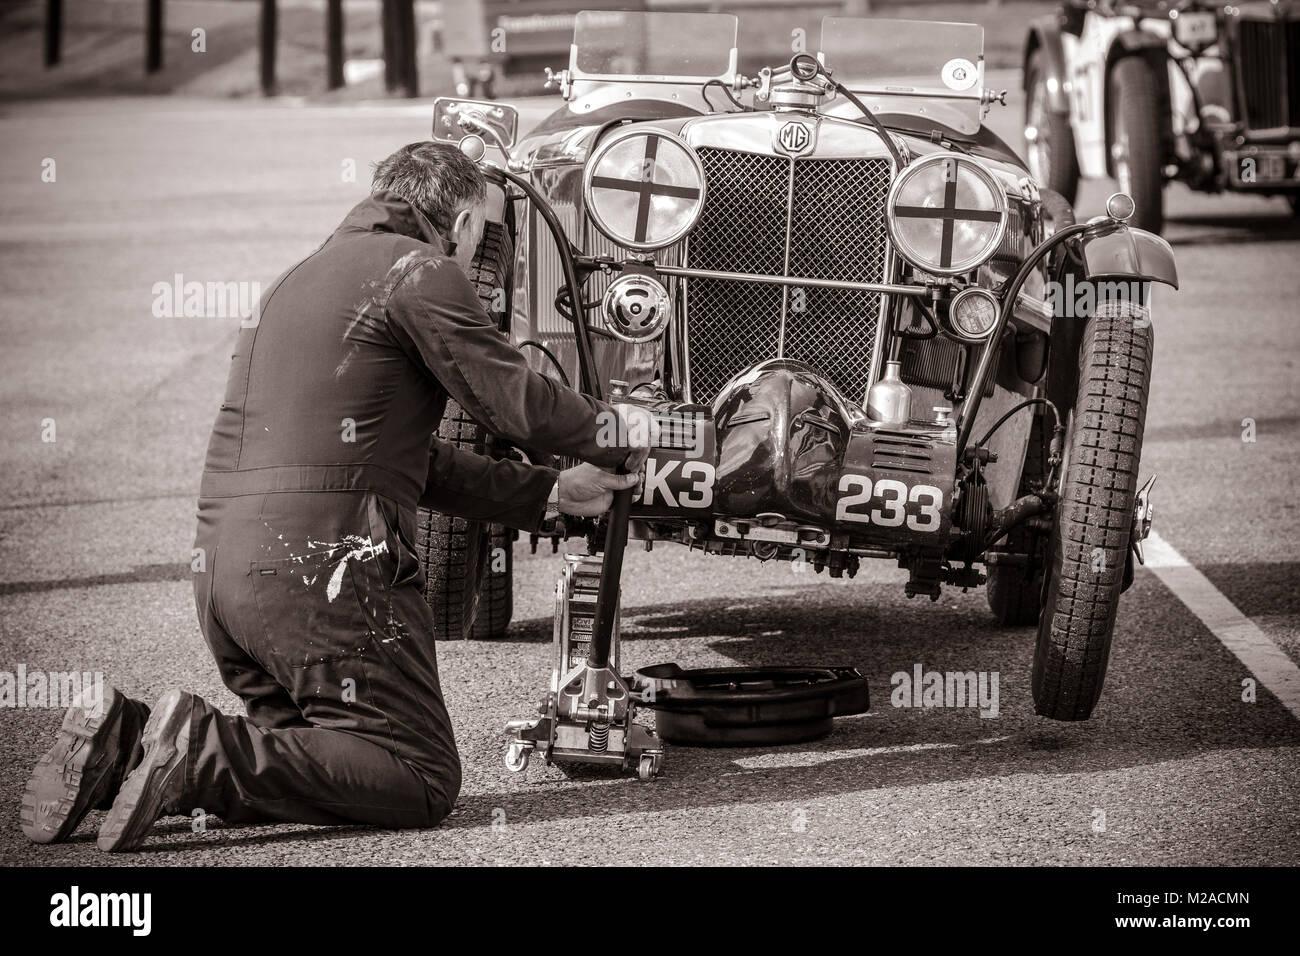 Vintage Car Mechanic Stock Photos & Vintage Car Mechanic Stock ...